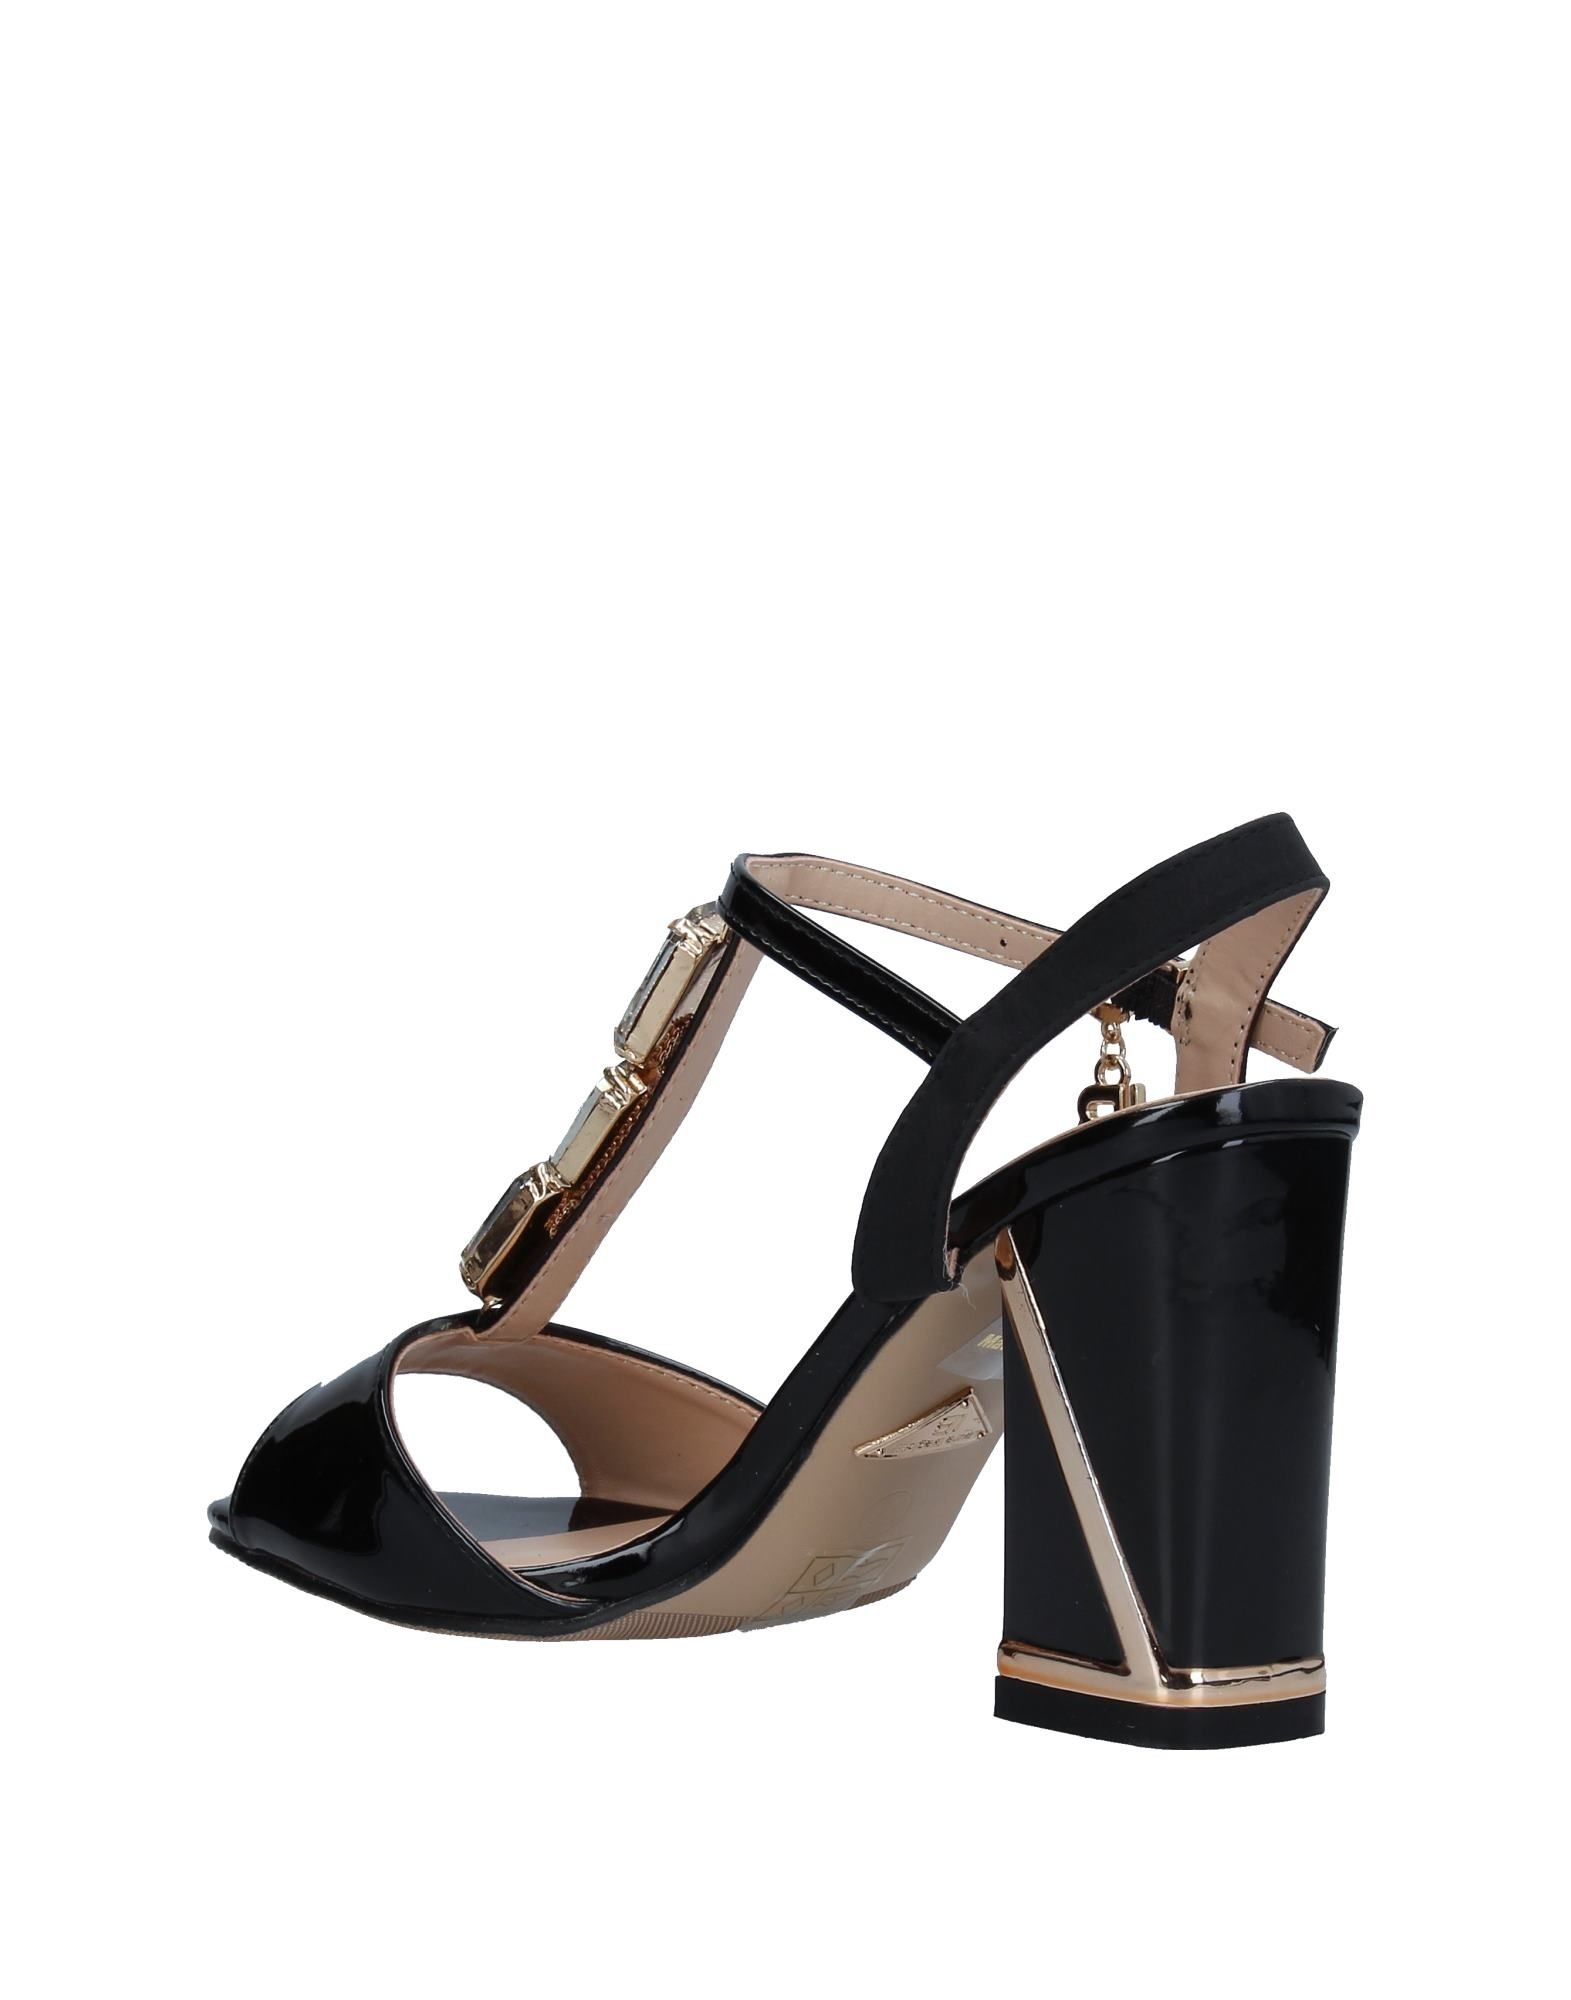 Laura Biagiotti Sandalen Damen 11373742UN  11373742UN Damen Gute Qualität beliebte Schuhe 539151